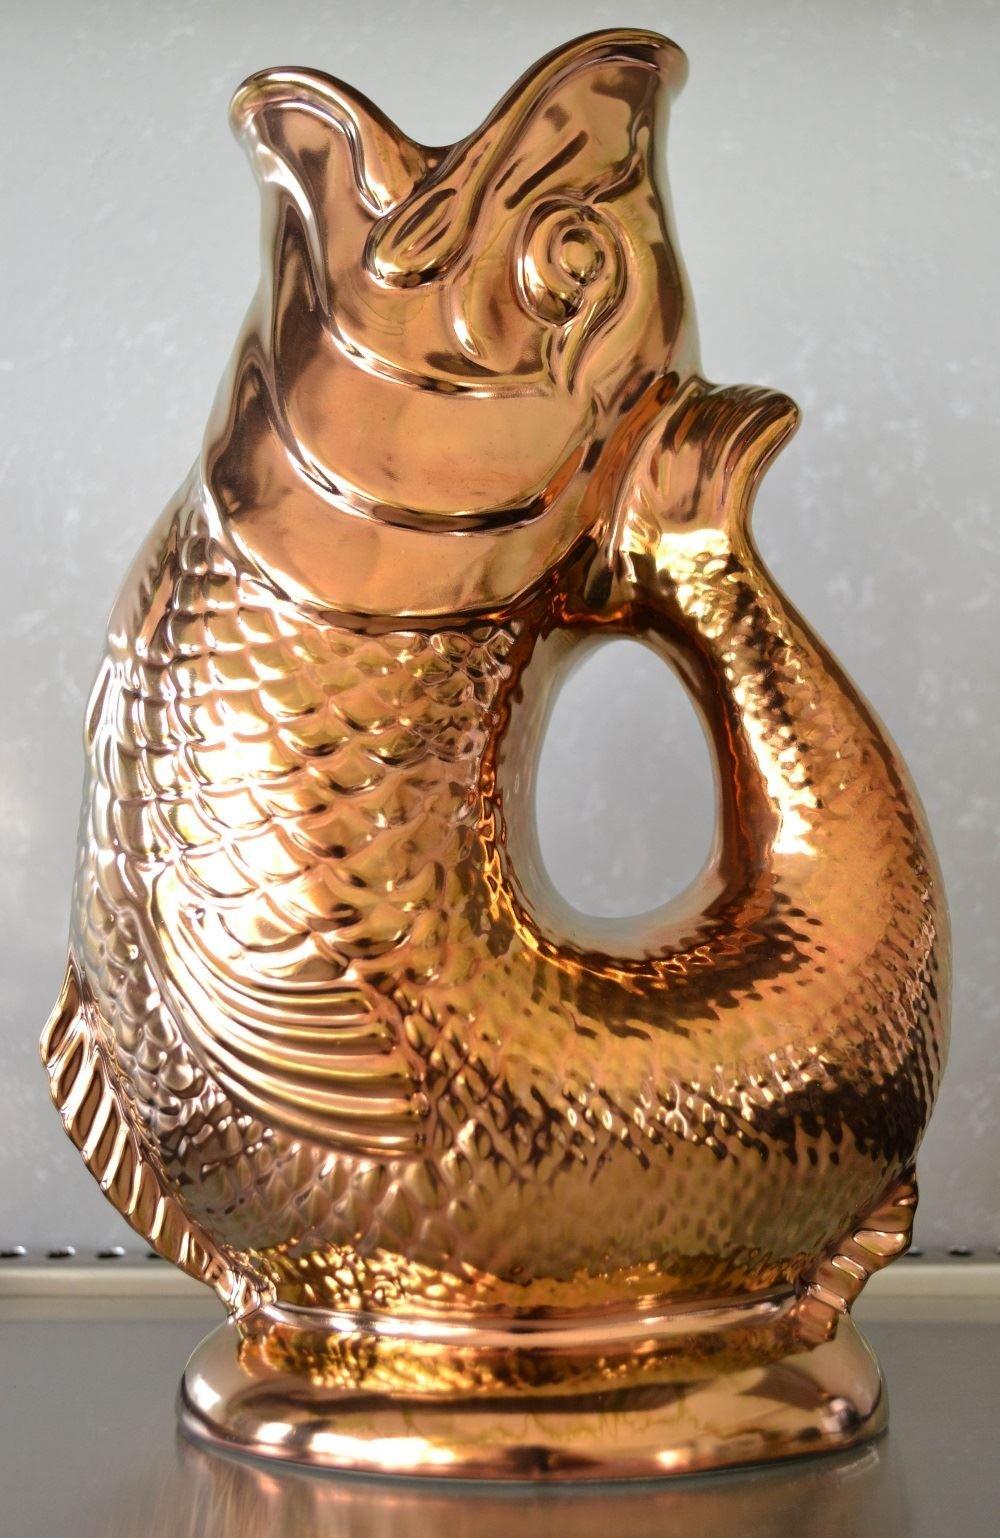 Wade Ceramics Copper Gluggle Jug Pitcher, X-Large